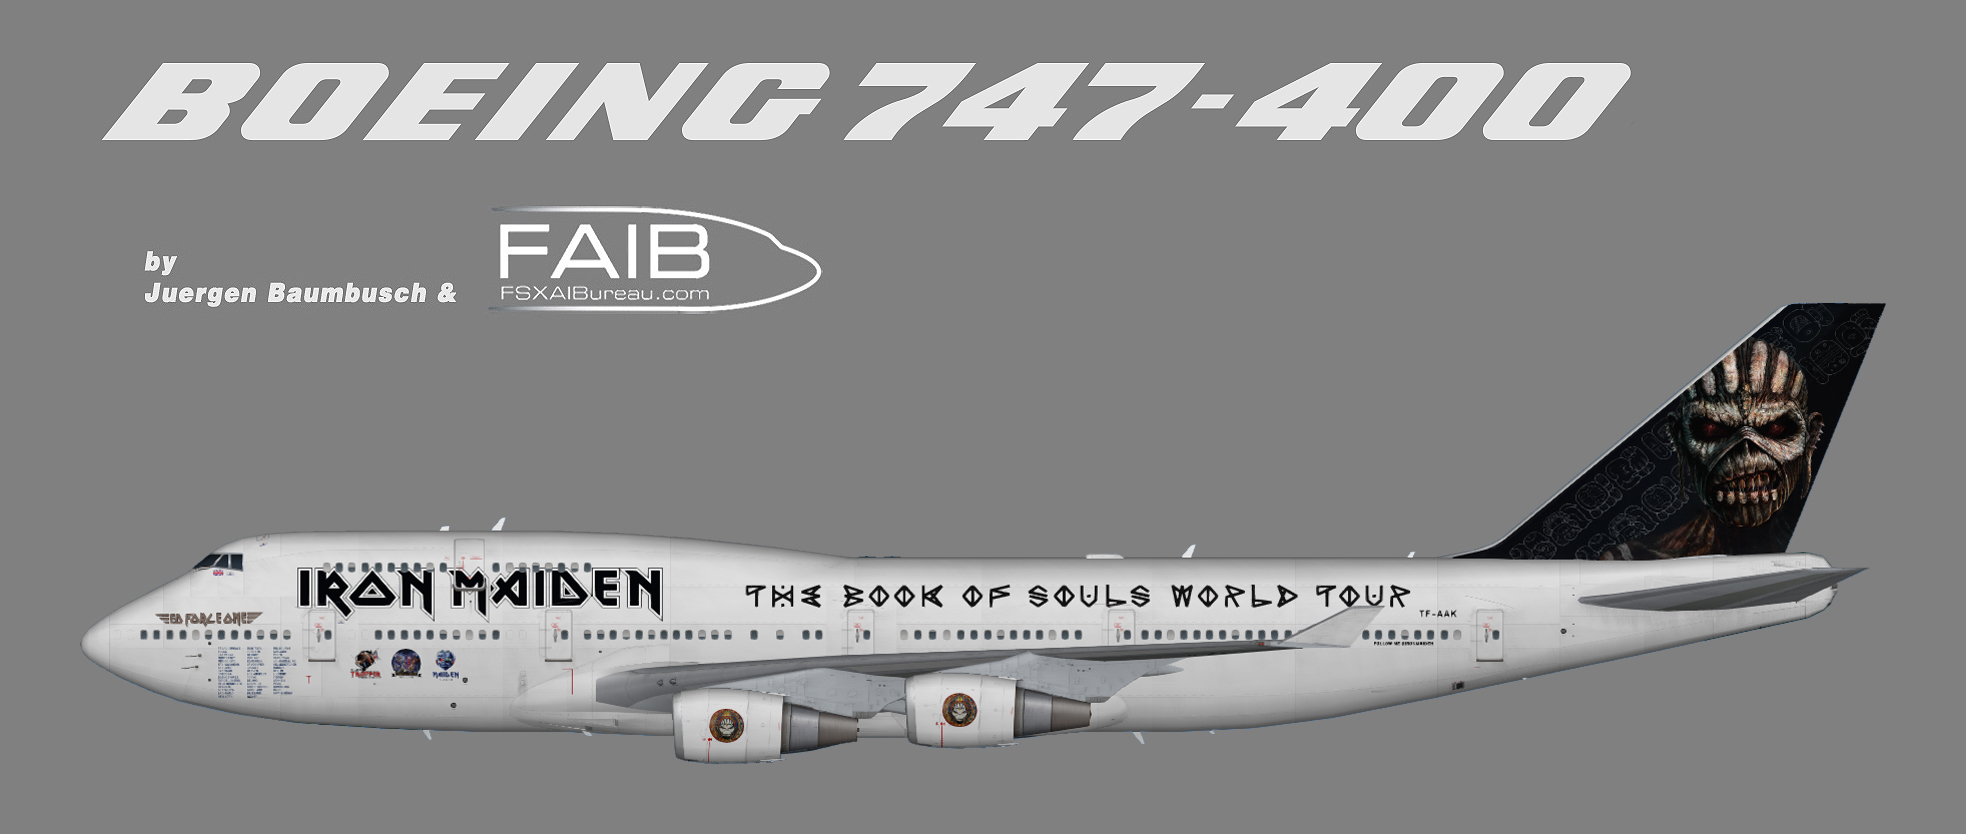 iron maiden 'ed force one' boeing 747-400 (opb air atlanta icelandic